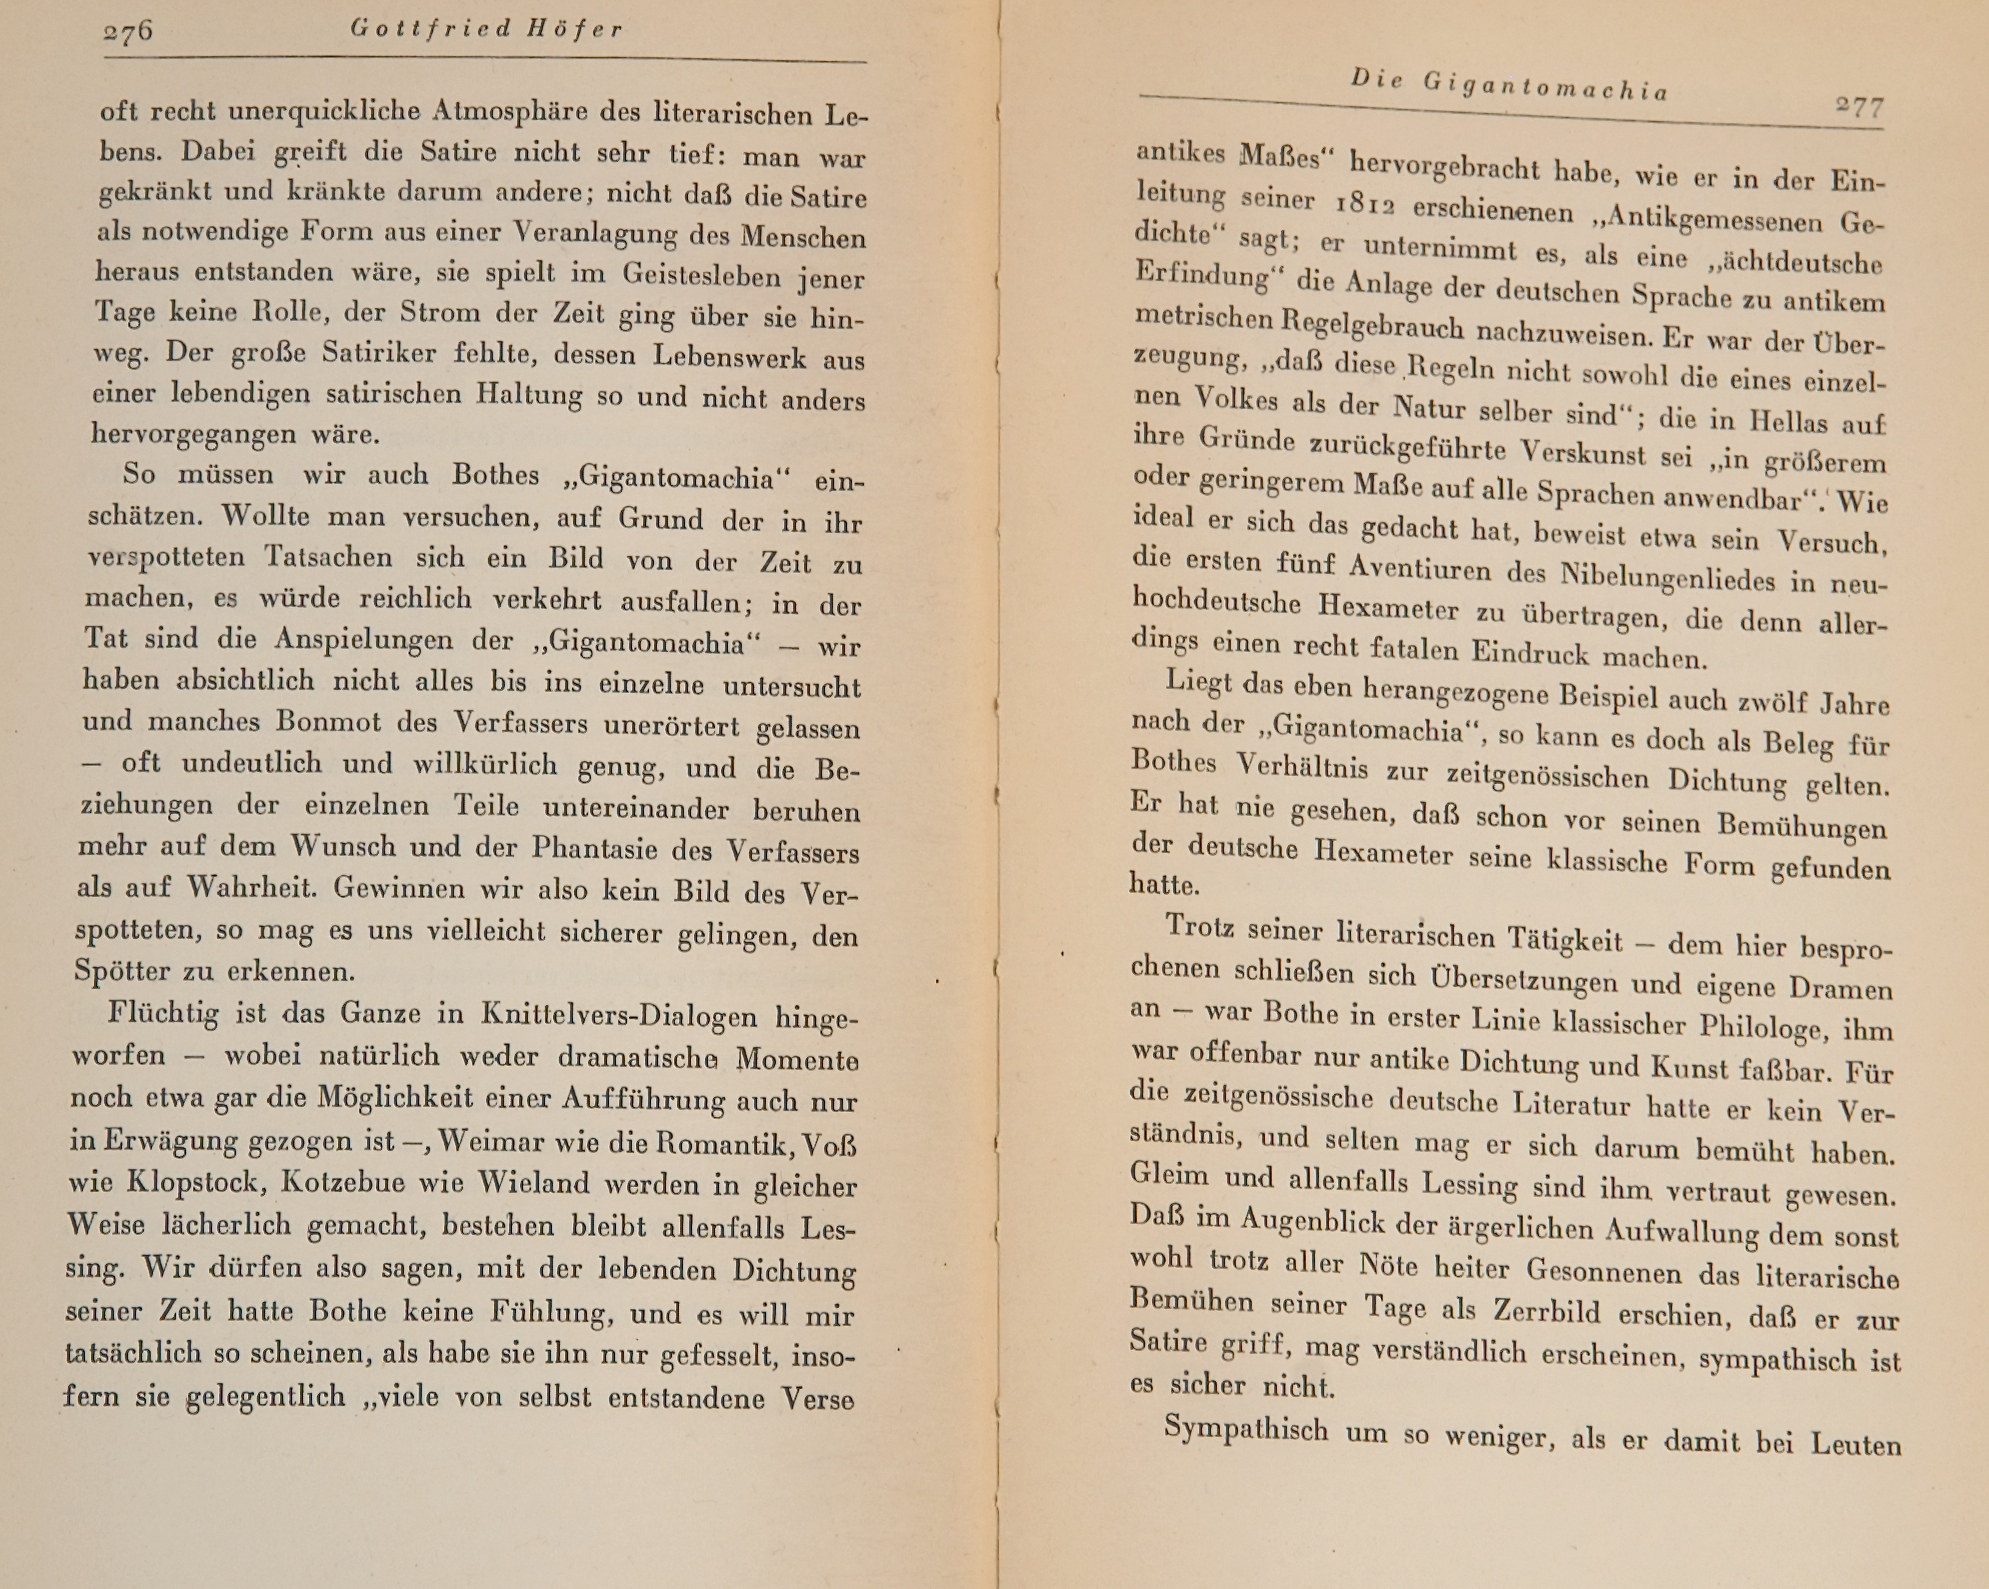 Das Goethezeitportal: Band 6 - Blatt 142